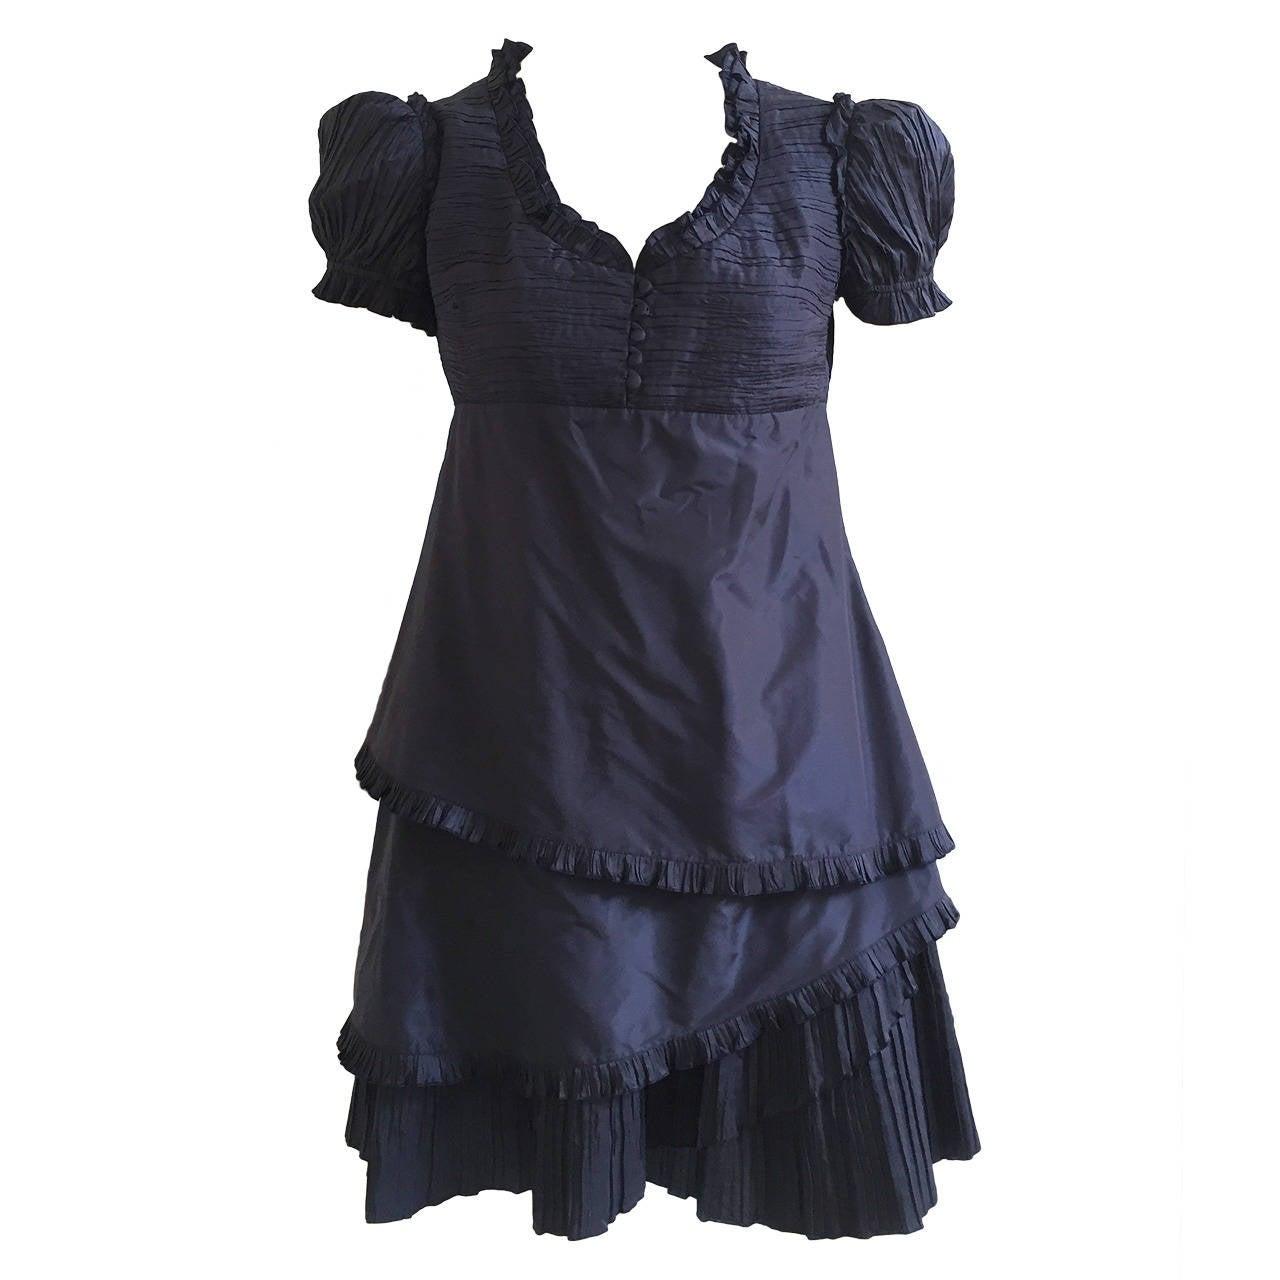 Blumarine Silk Dress Size 8.